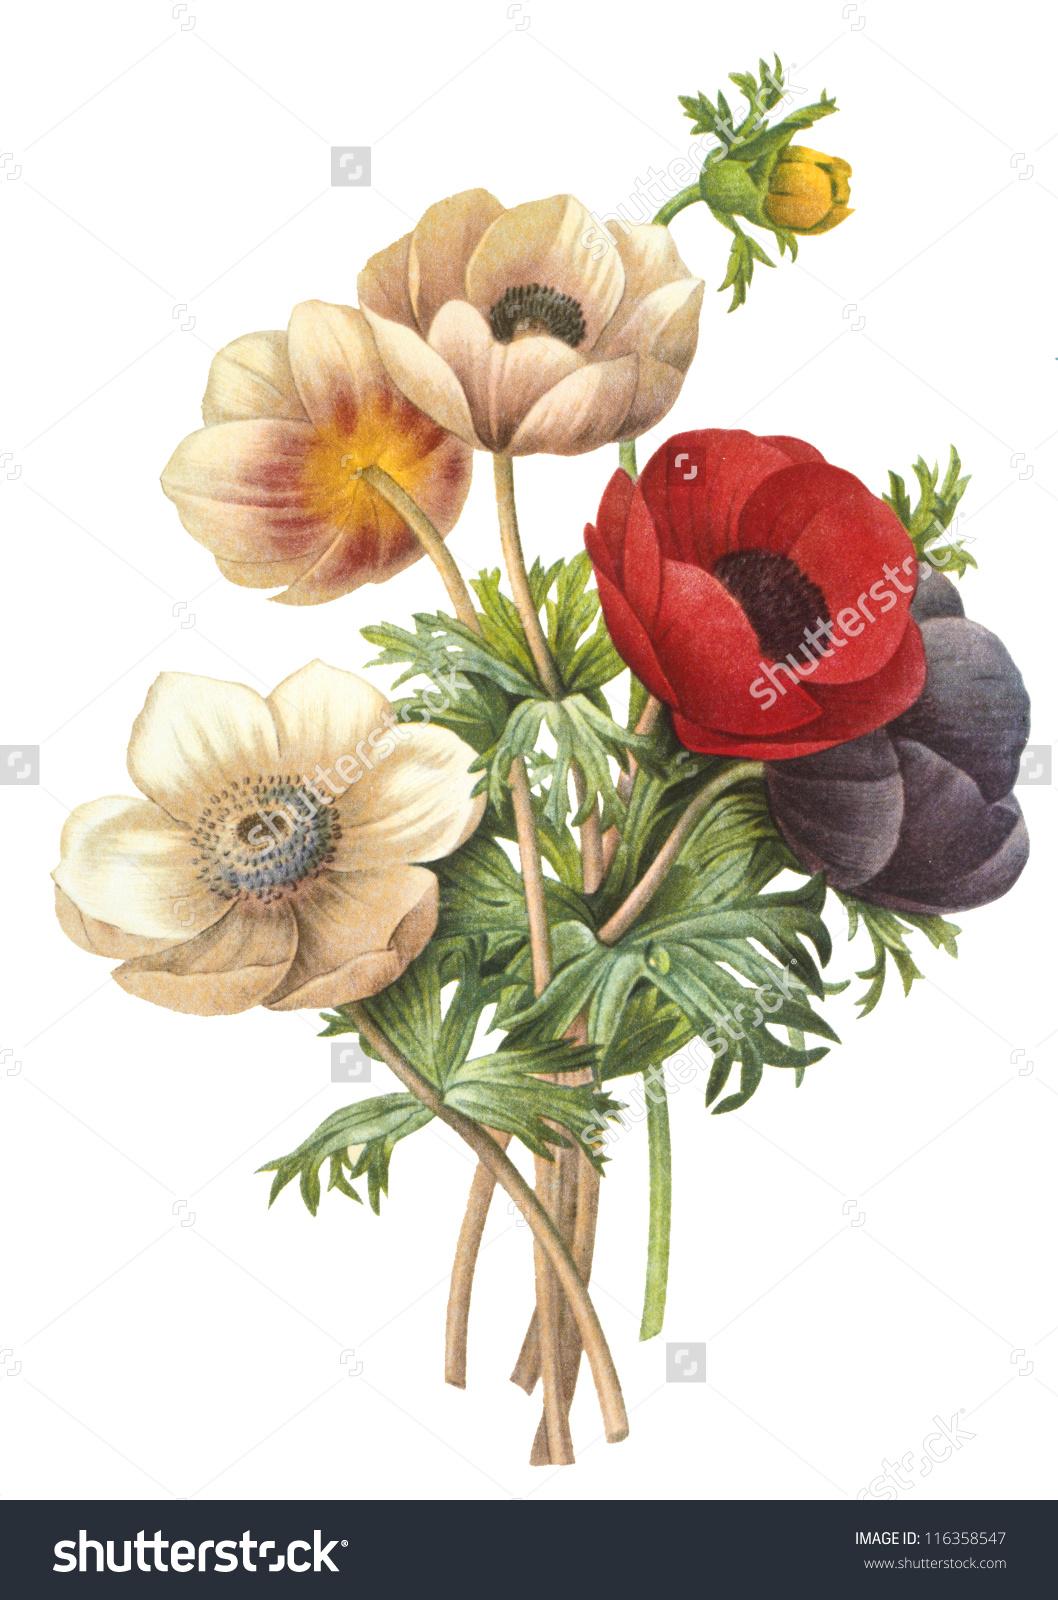 Flower Illustration Stock Photo 116358547.